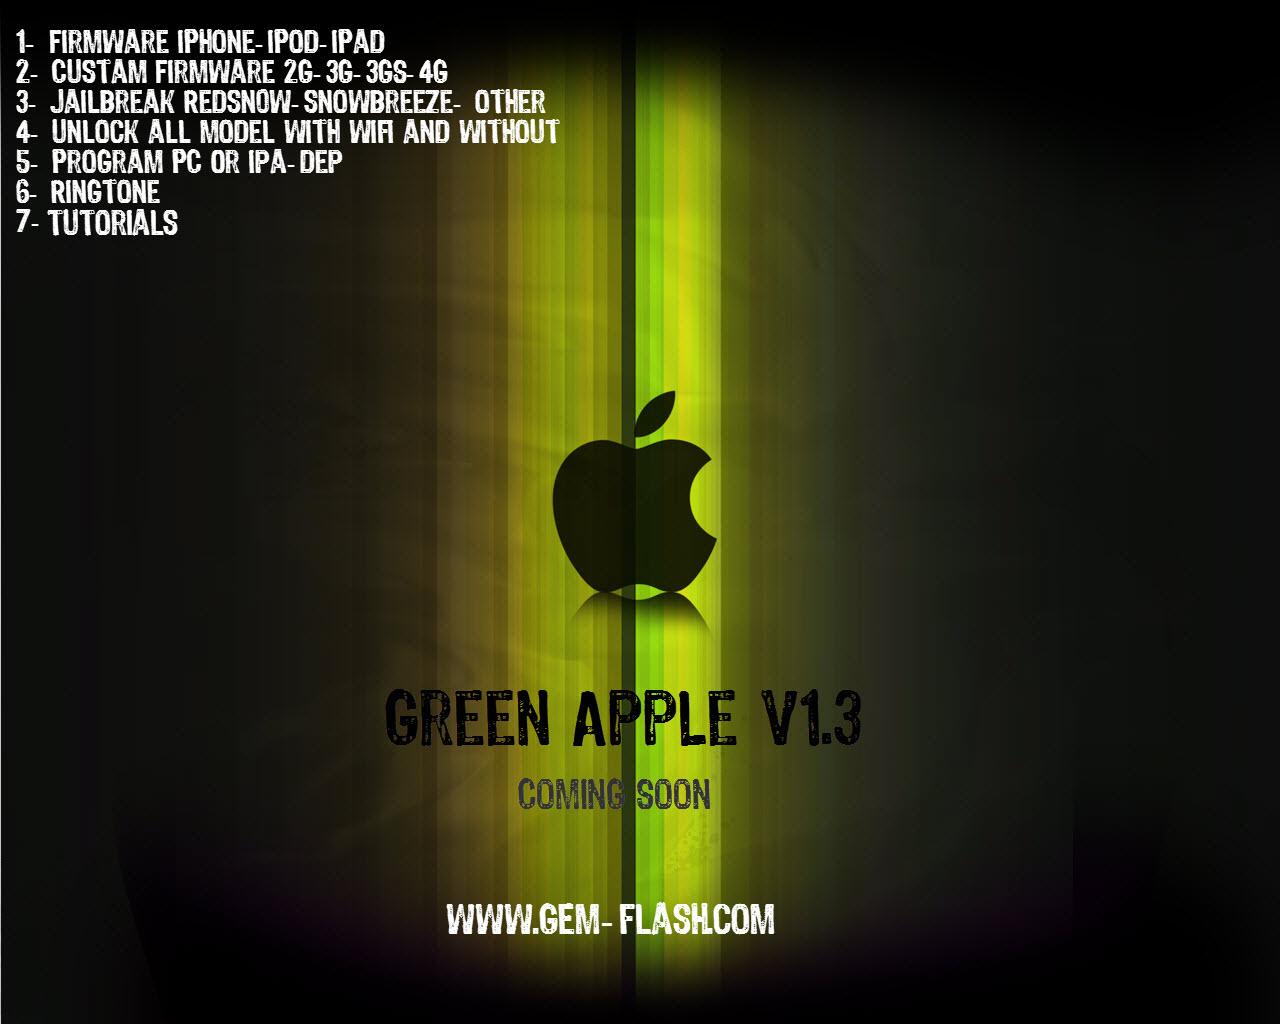 موضوع خاص بتحديثات برنامج Green Apple